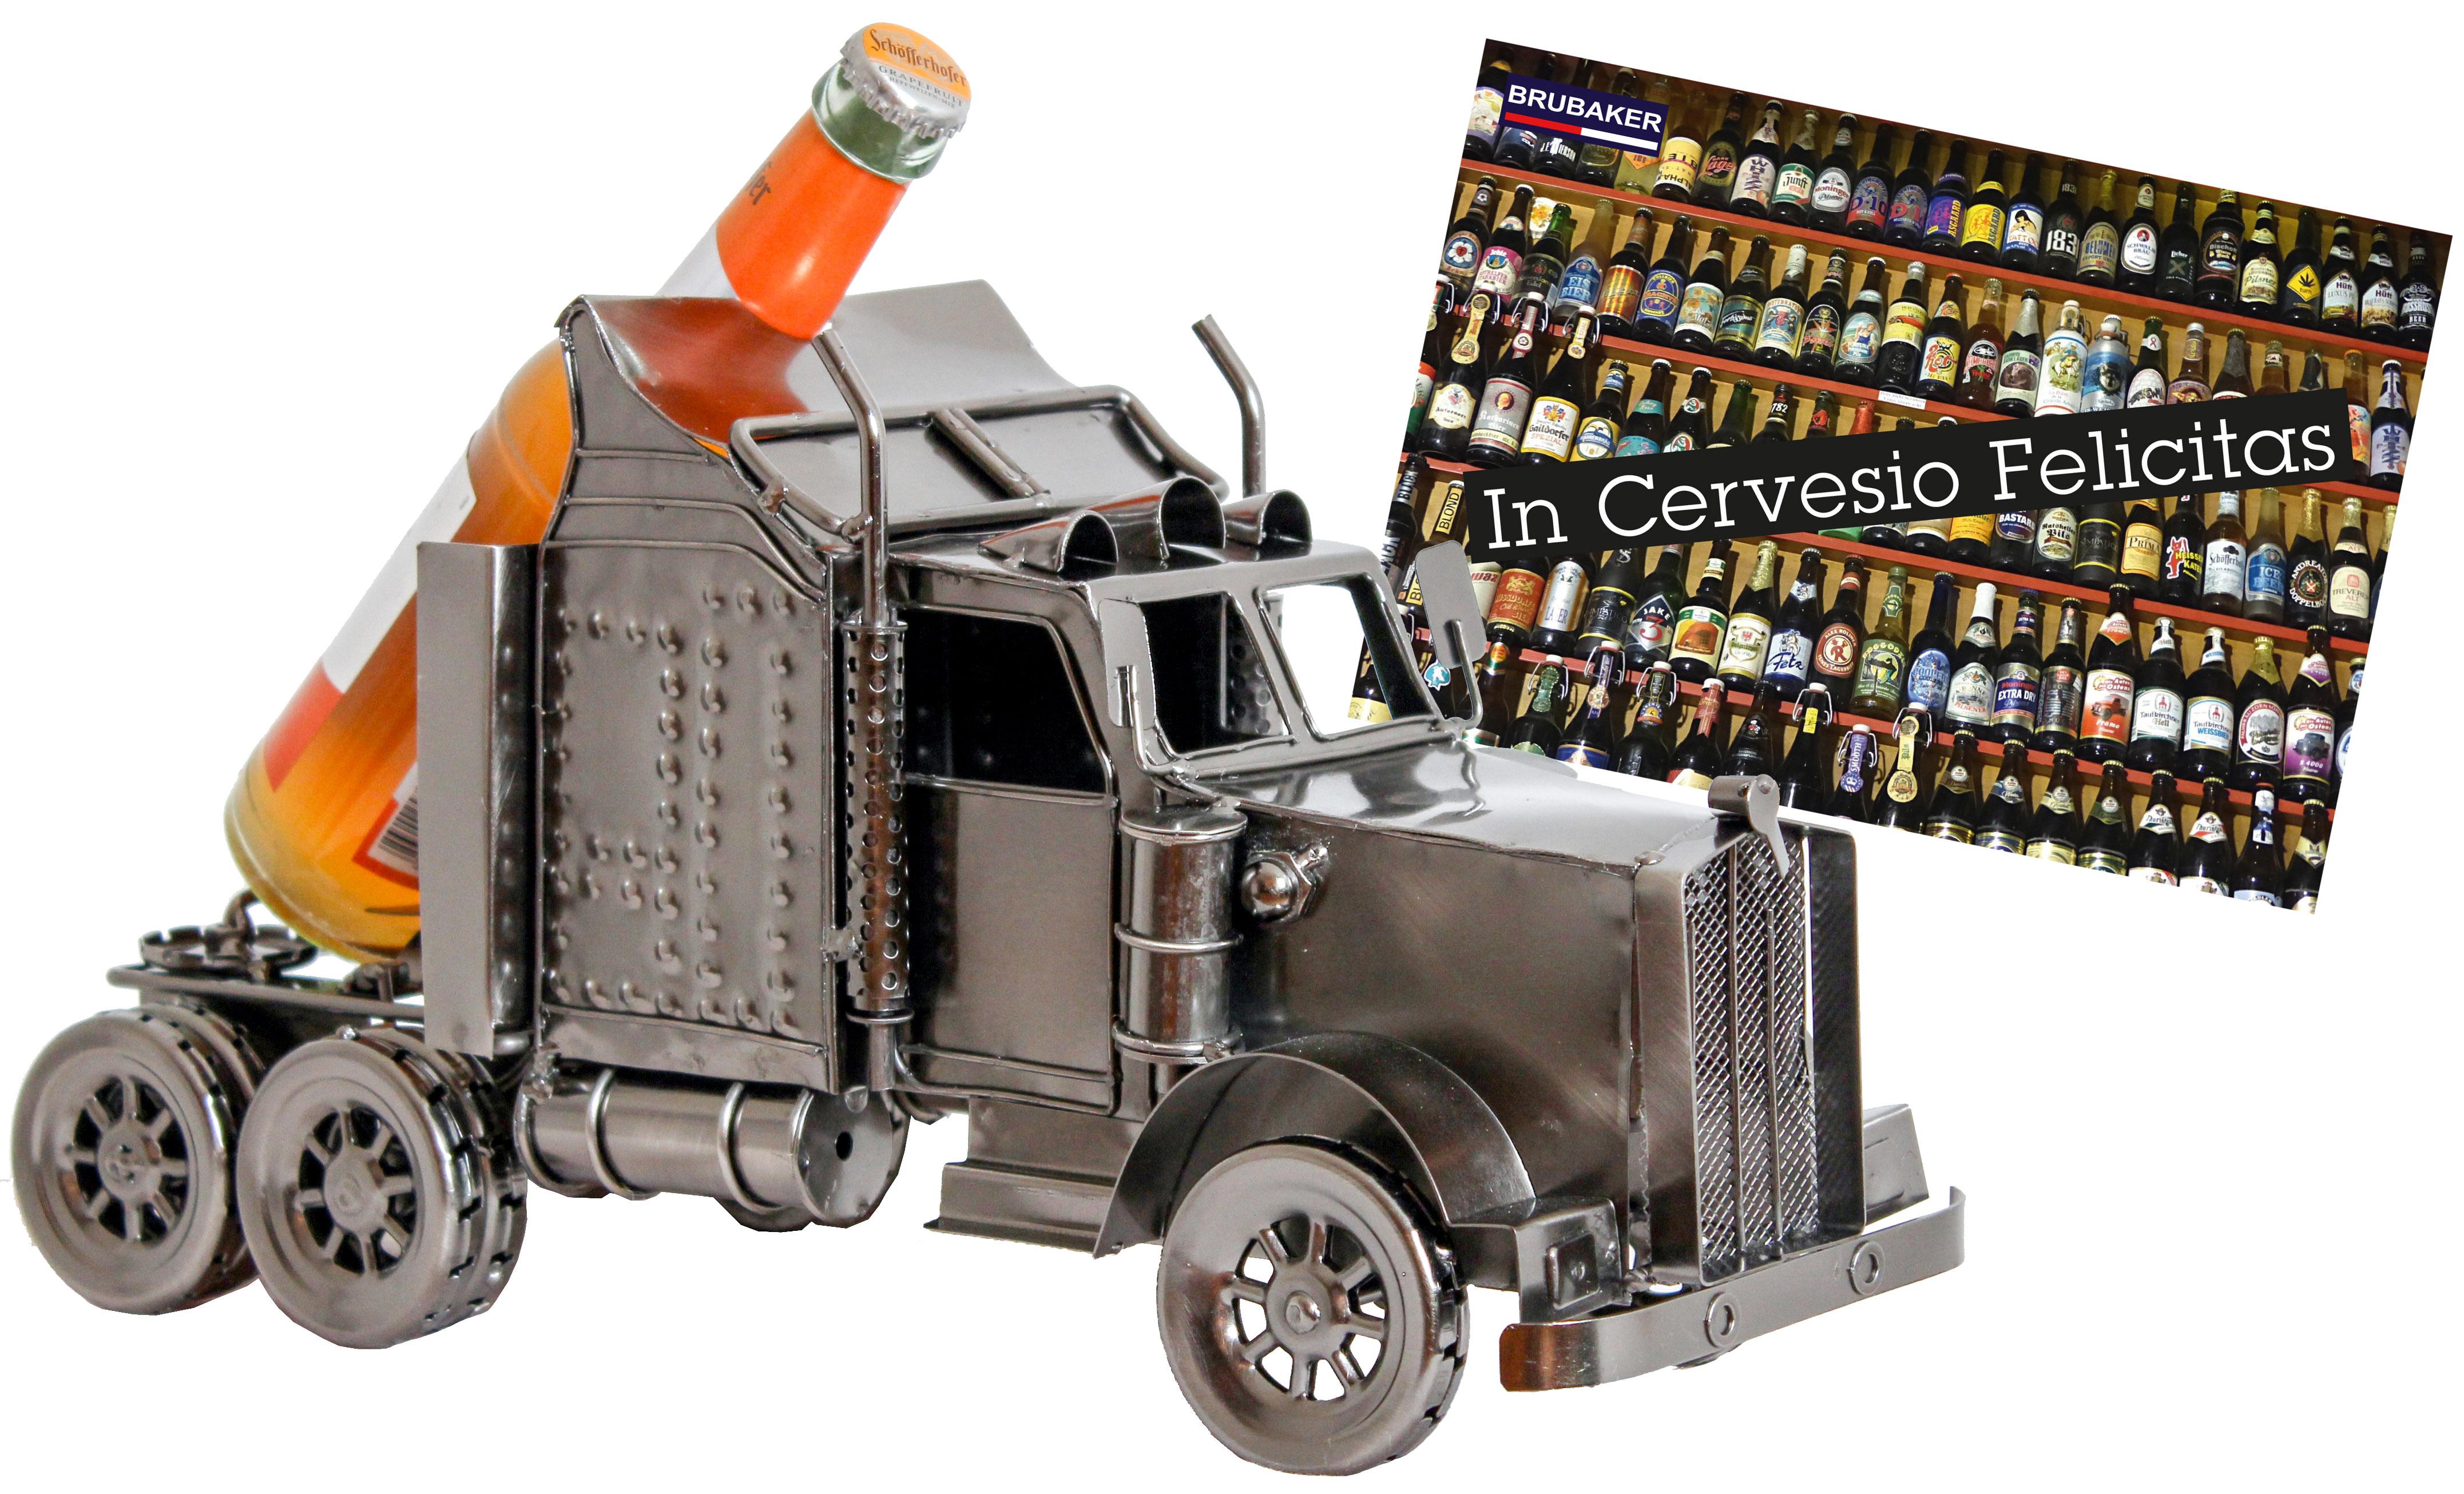 brubaker bier flaschenhalter truck metall skulptur geschenk mit geschenkkarte. Black Bedroom Furniture Sets. Home Design Ideas